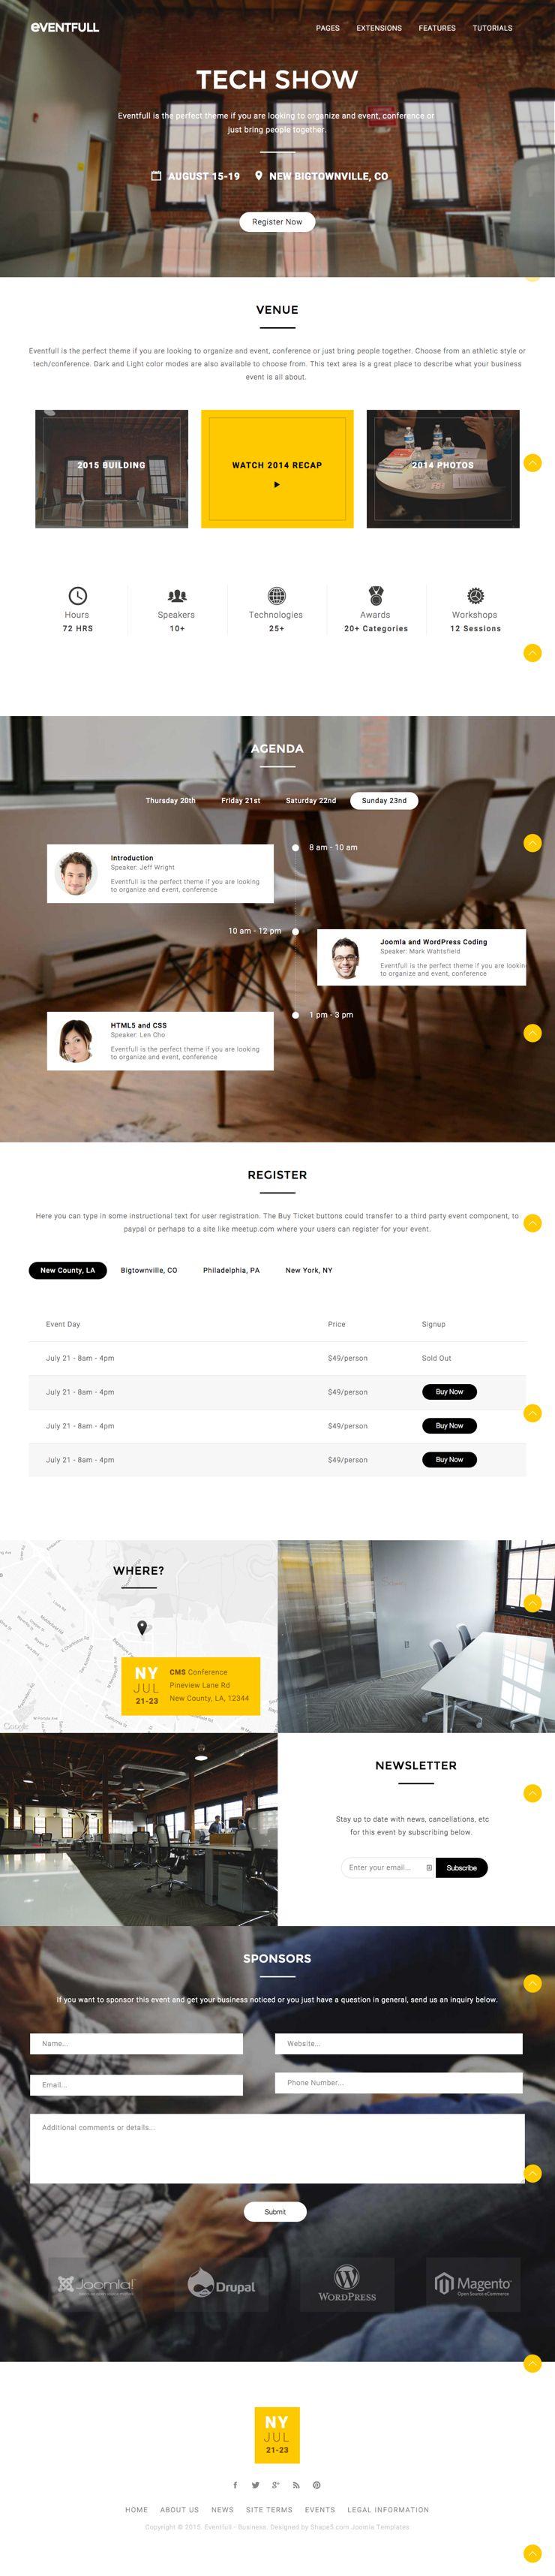 Eventfull Joomla Business Style Template